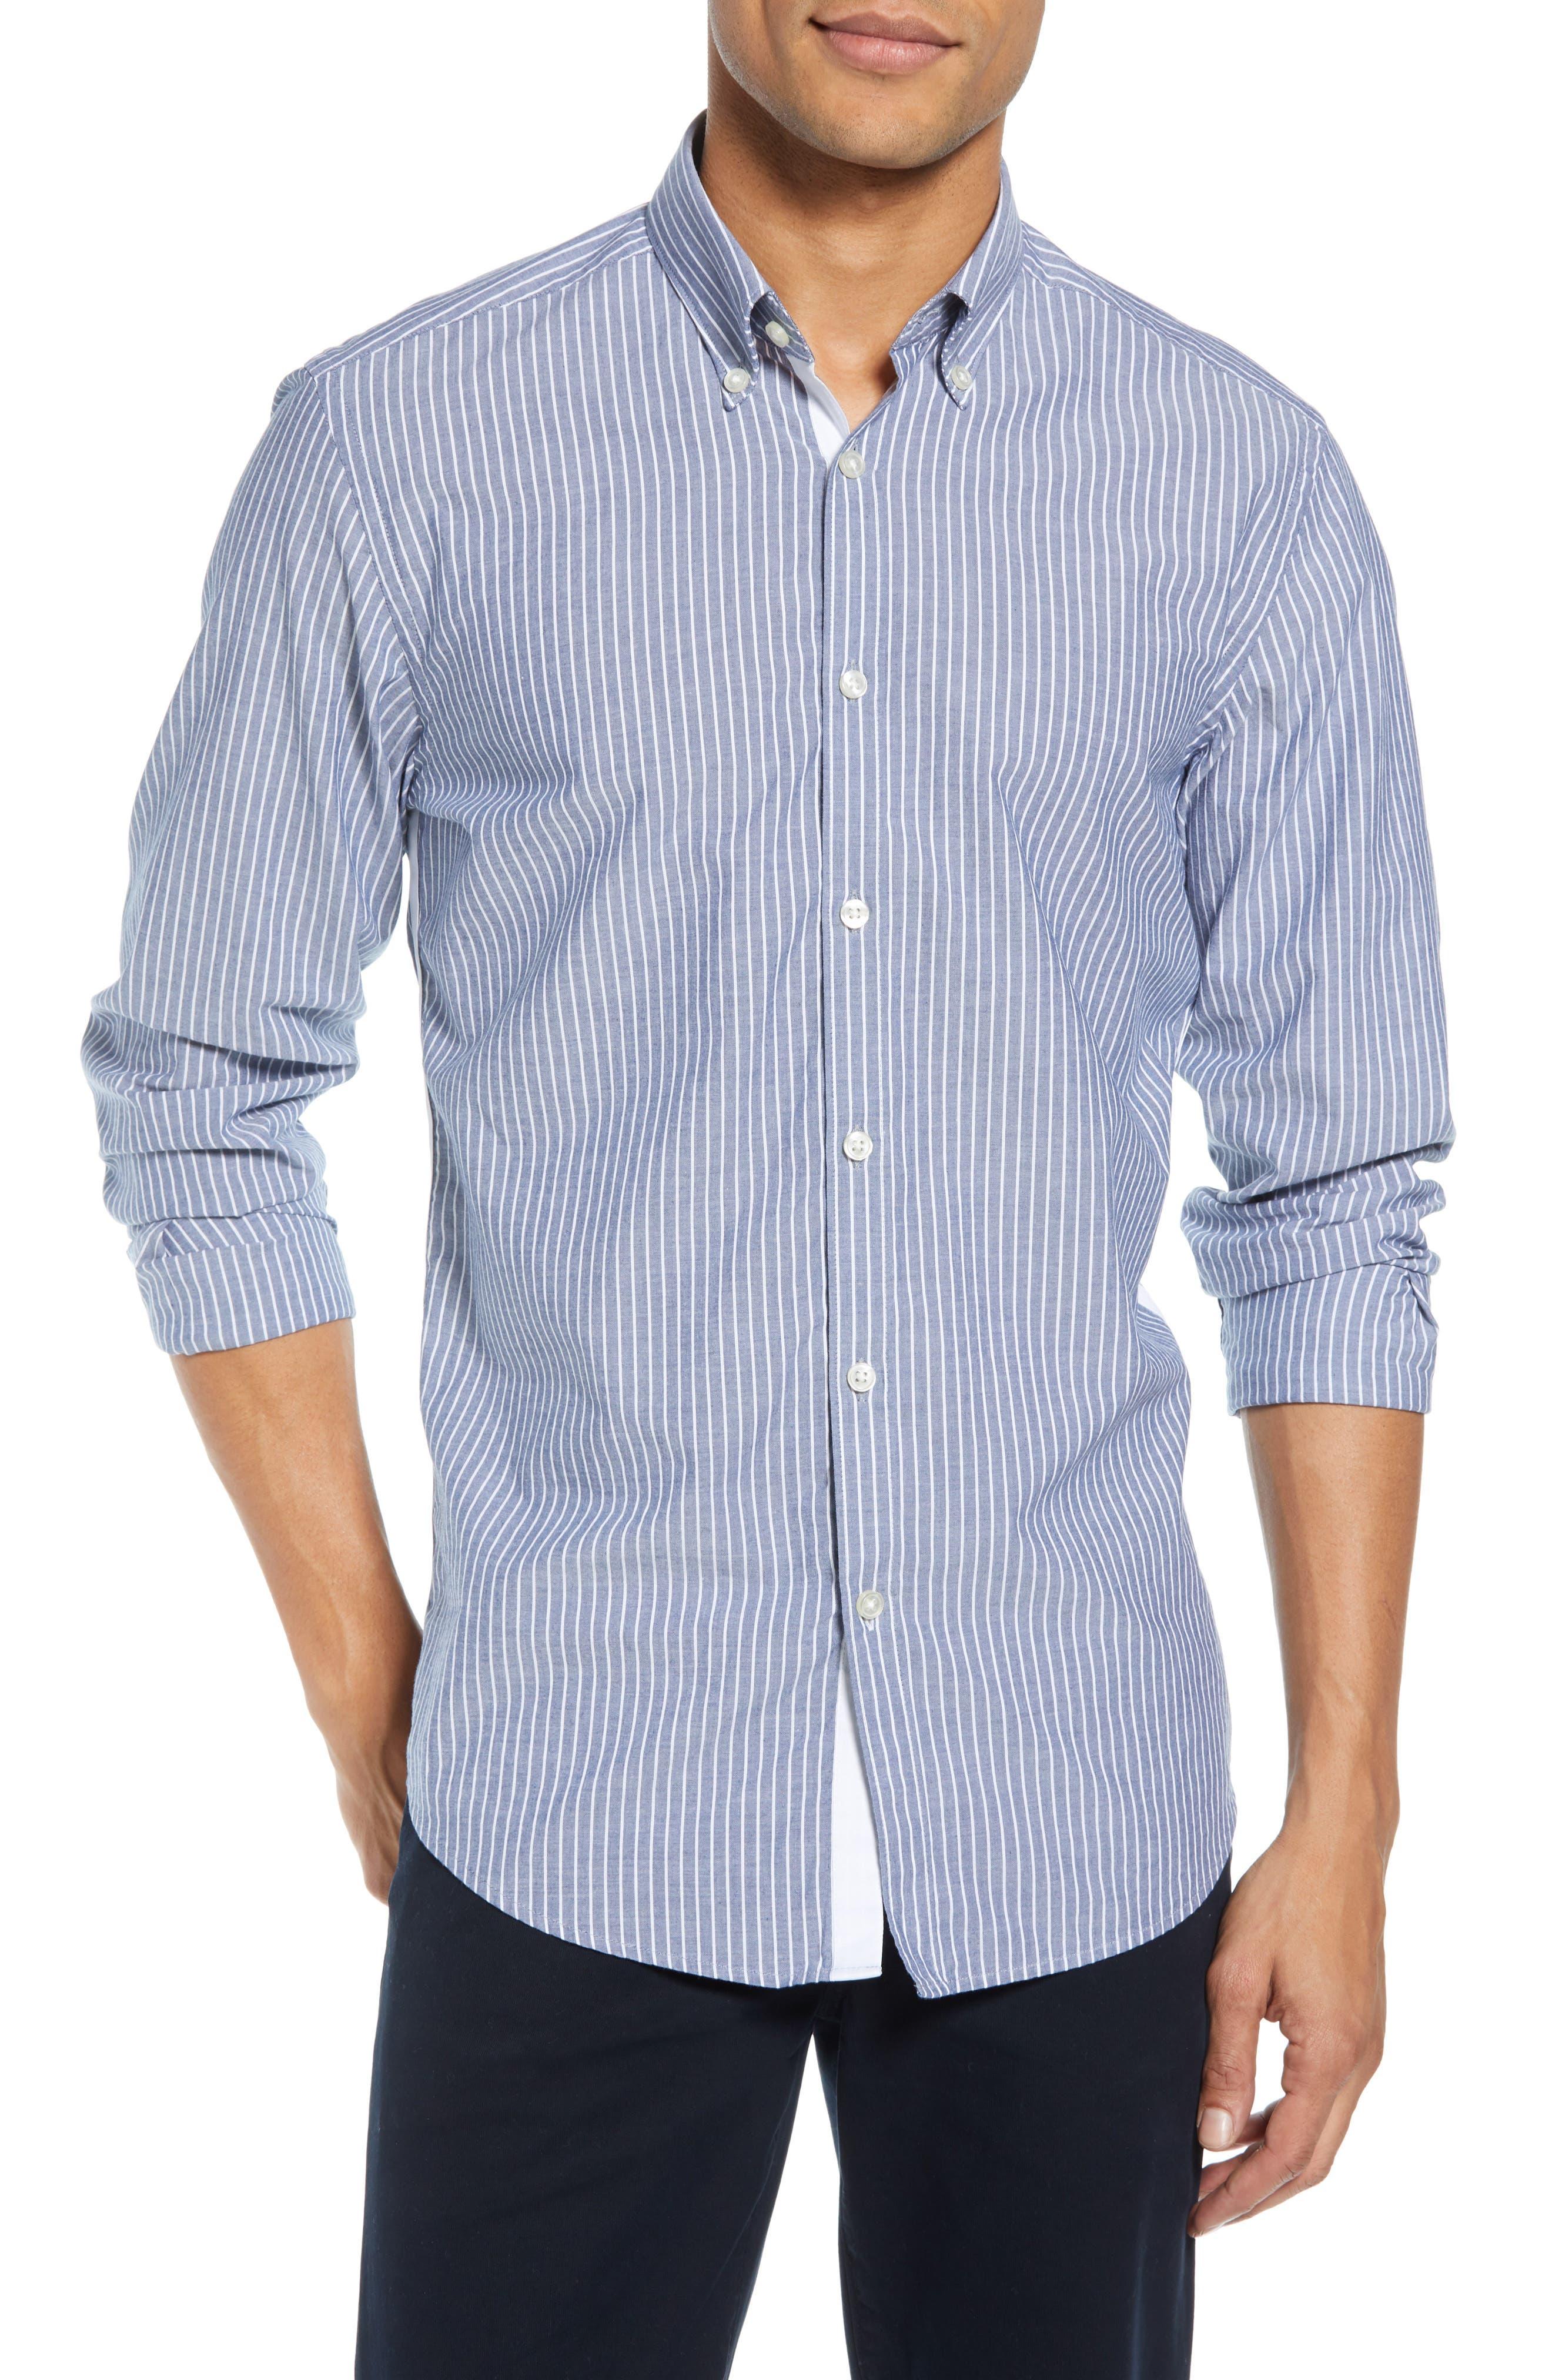 d149b6cdd7c Casual Button-Down Shirts Hugo Boss for Men